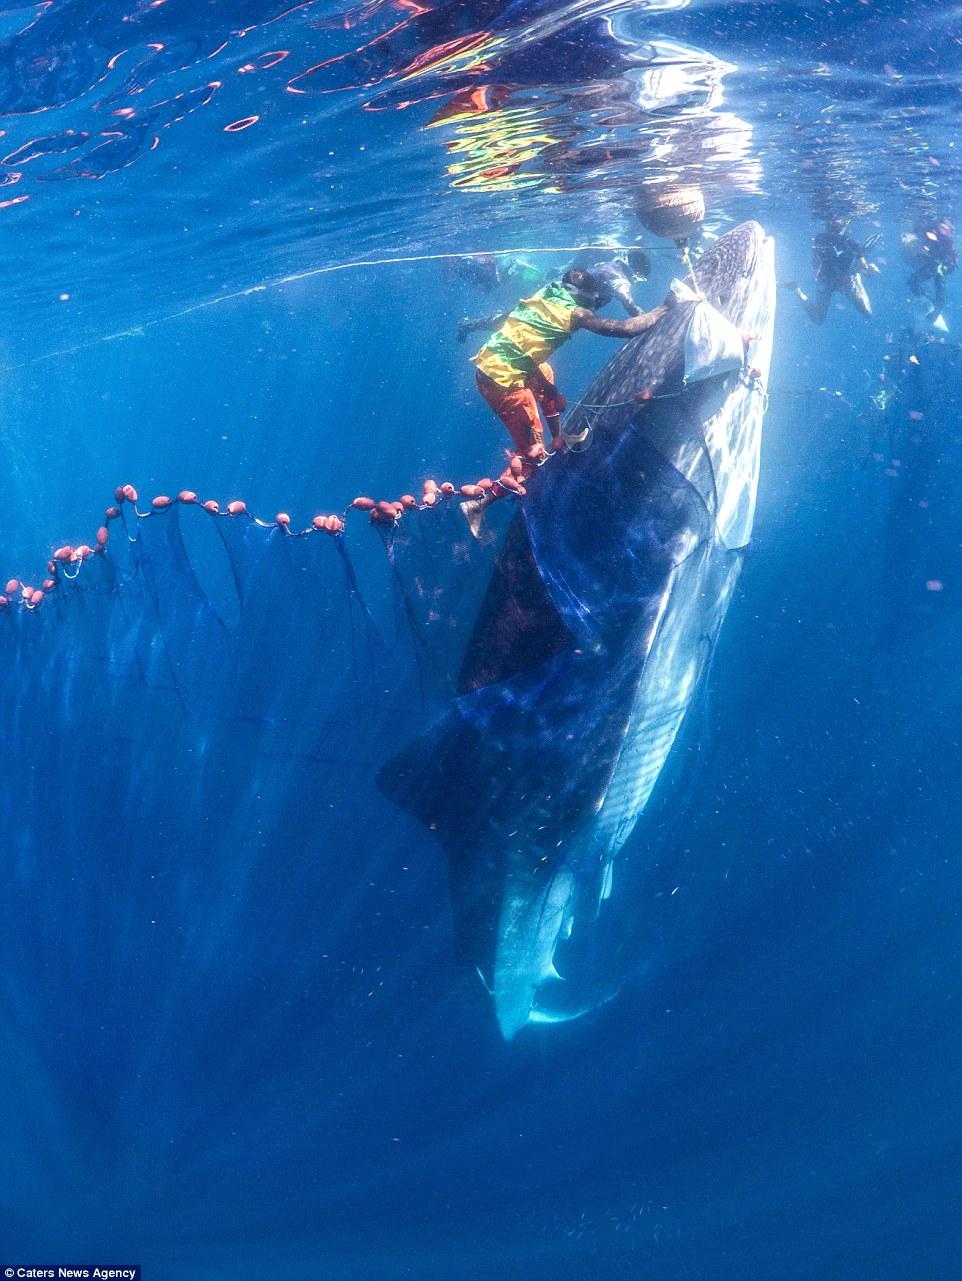 Hd Great White Shark Wallpaper Marine Biologist S Stunning Photographs Show Encounters